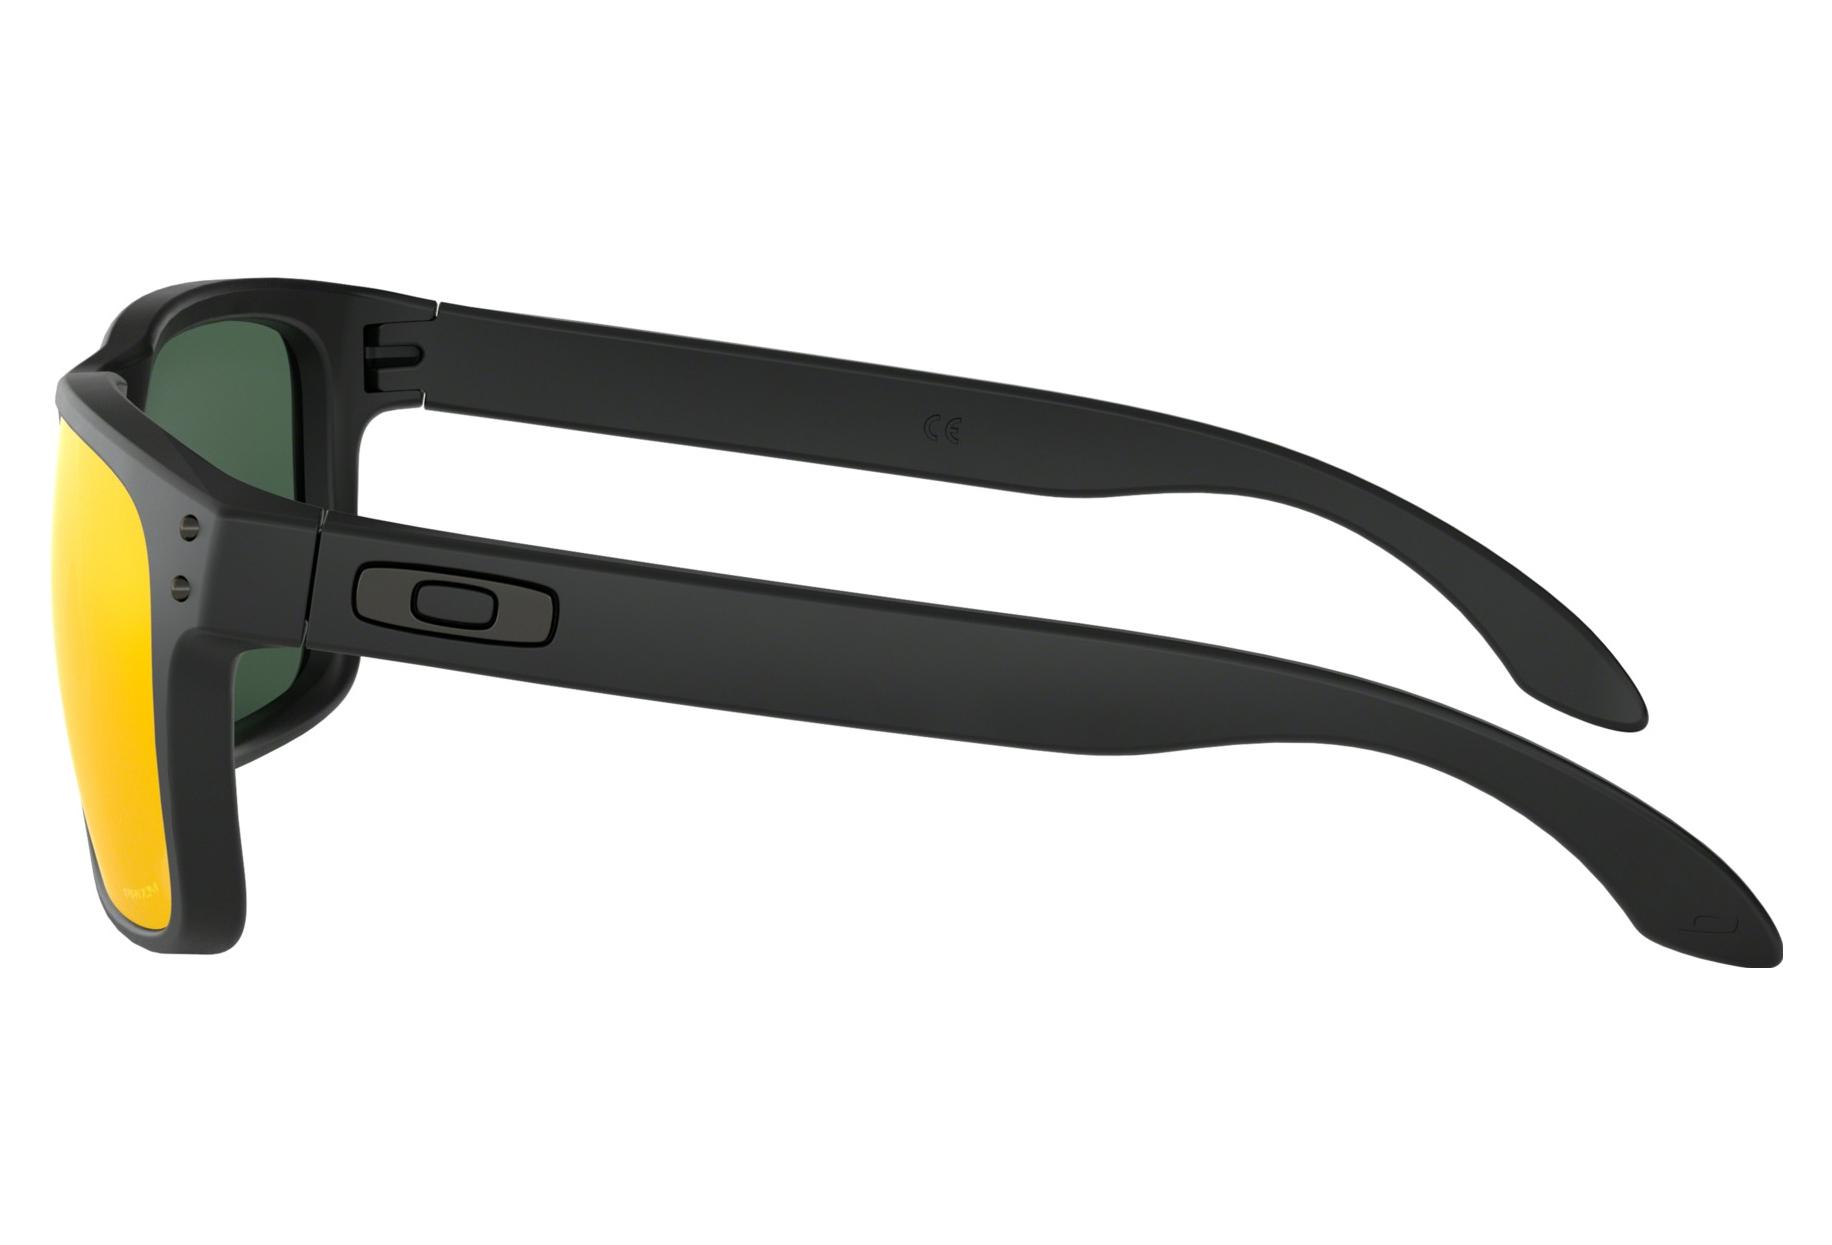 Matte Black E2 Holbrook Ruby RefOo9102 De Oakley Lunettes Paire Prizm vnmwN08O